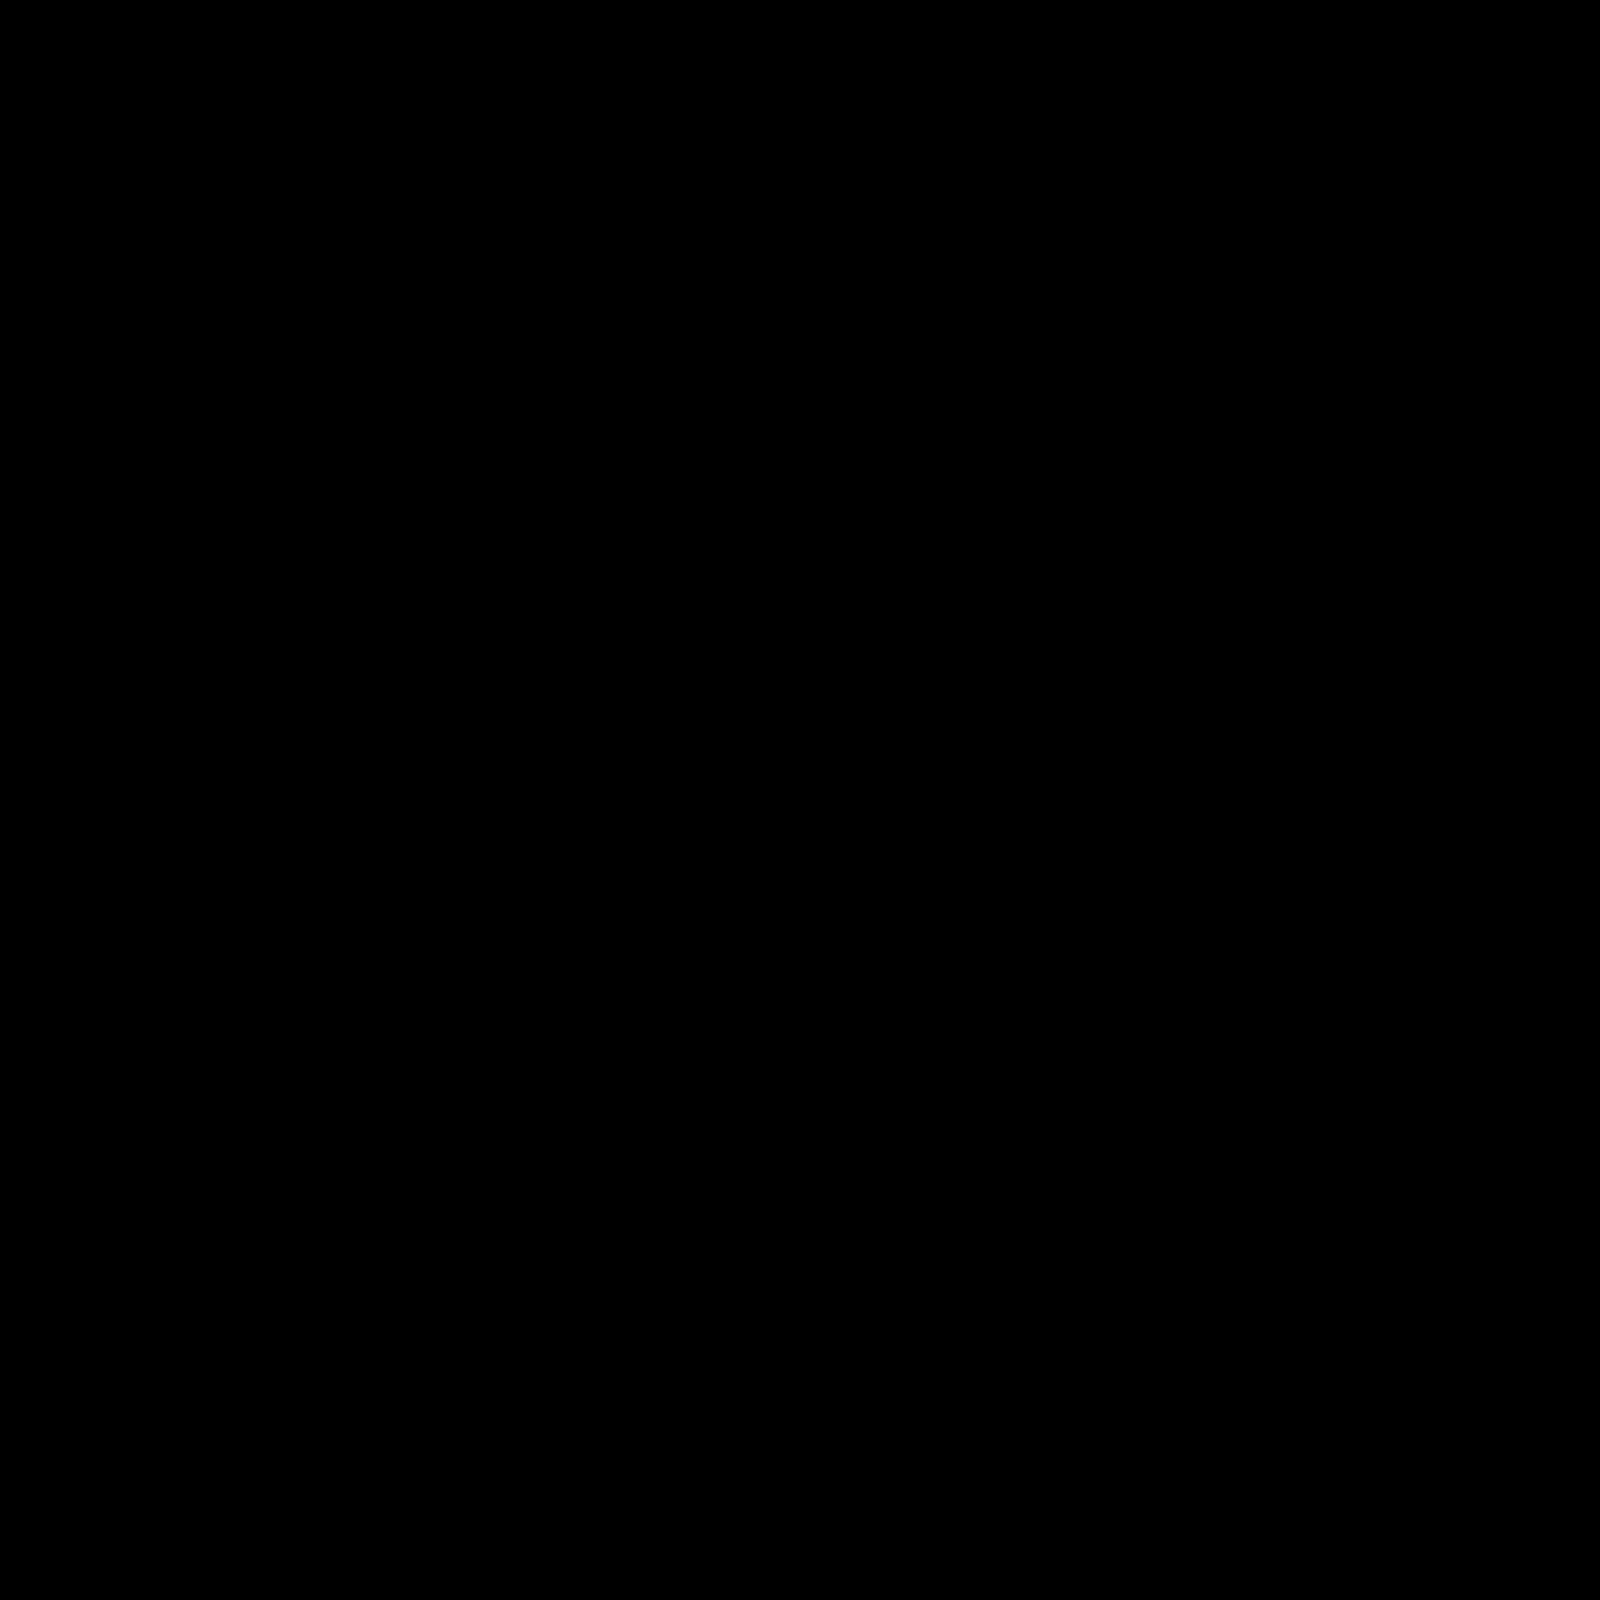 Distillation columns filled icon. Column clipart free vector